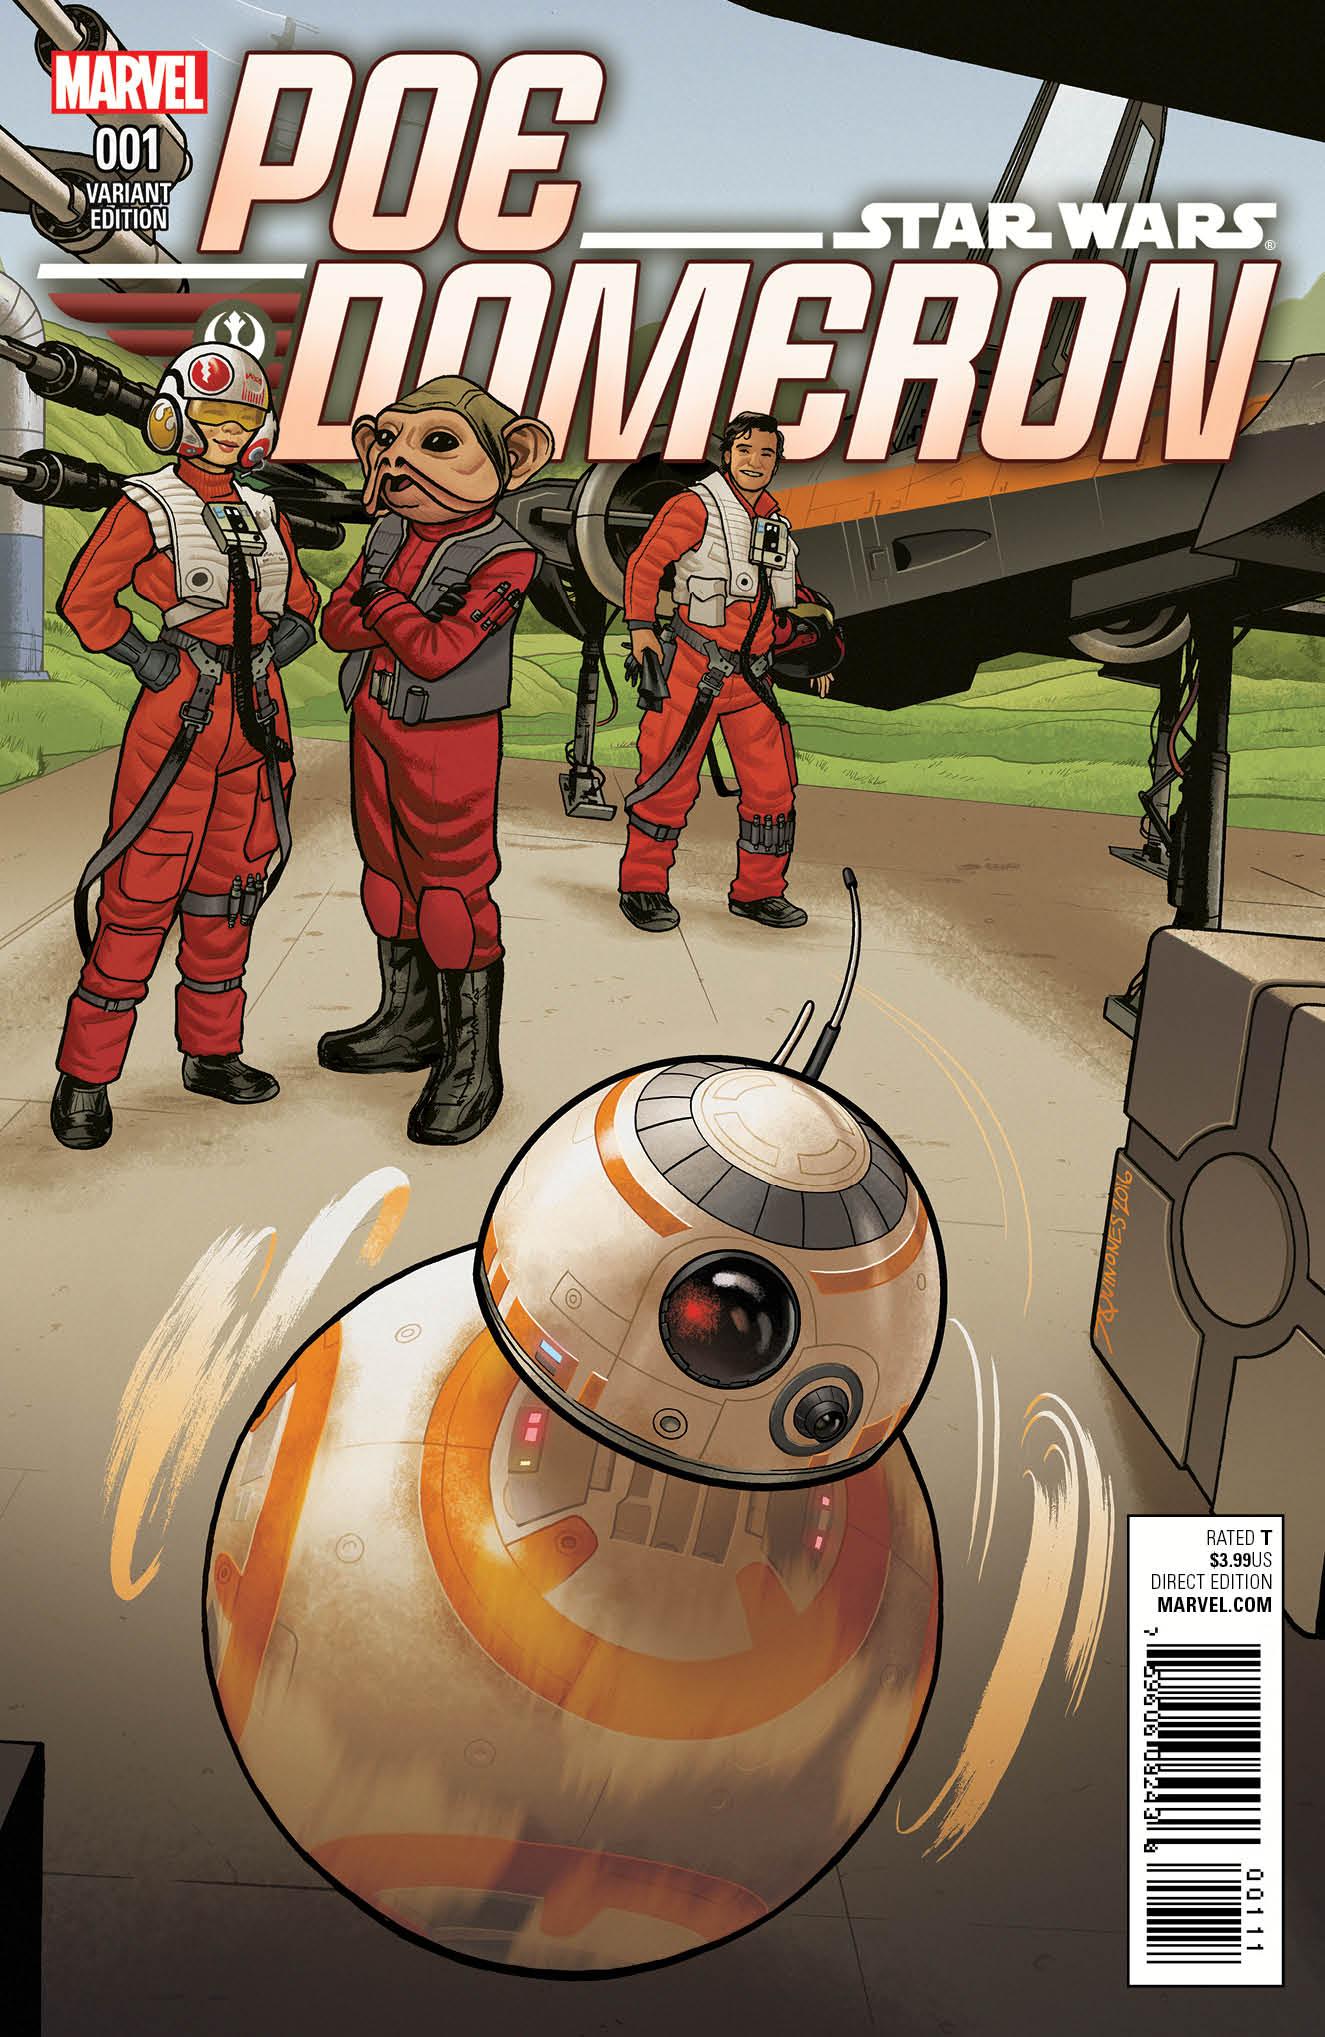 BB-8 Variant by Joe Quinones